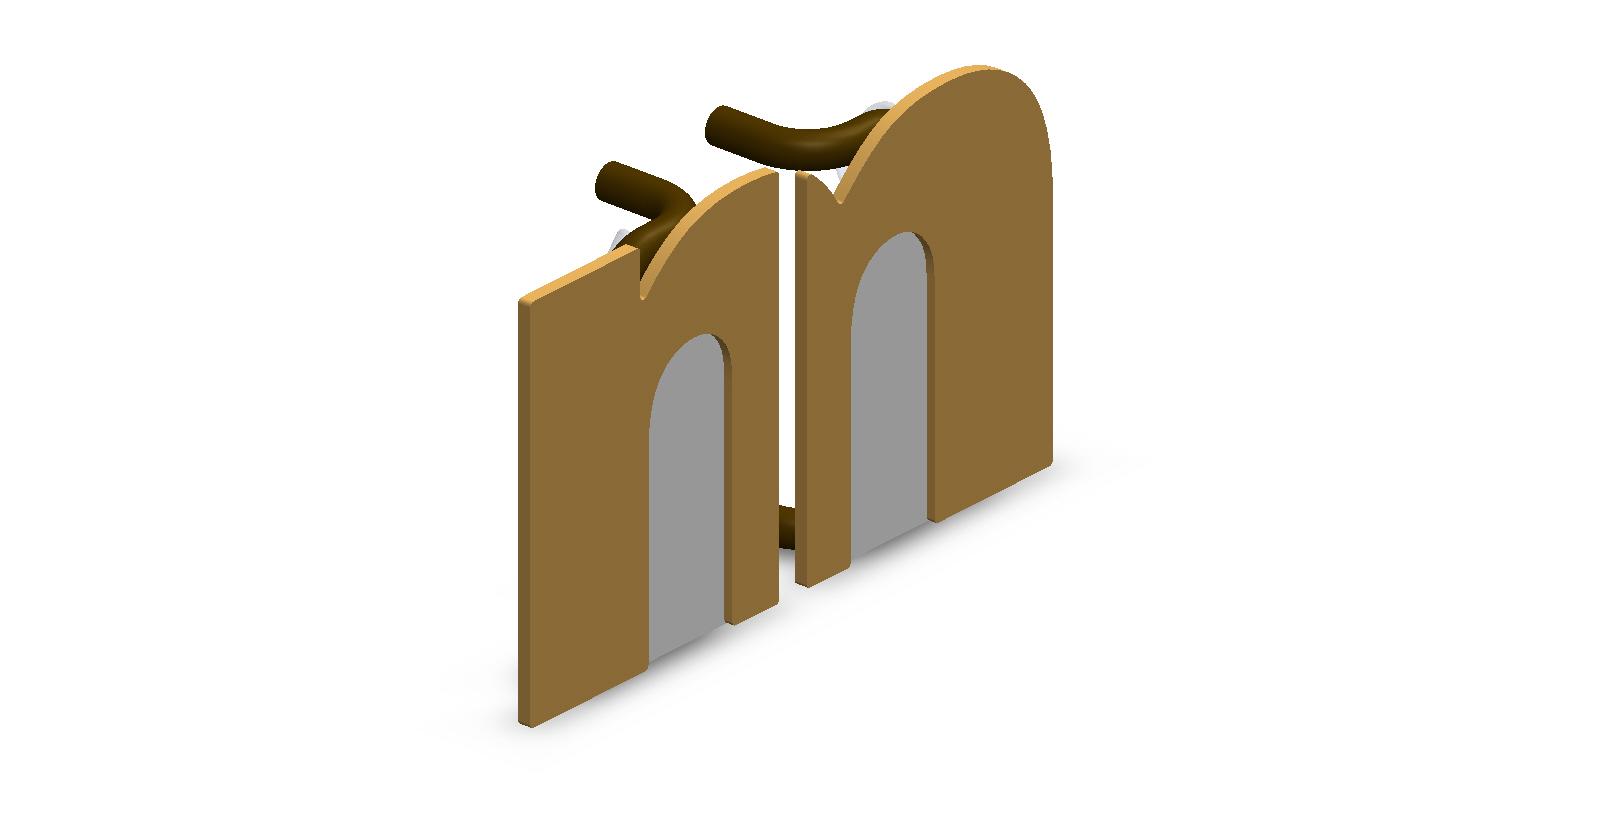 Customize M Split Door Handles for Small Businesses